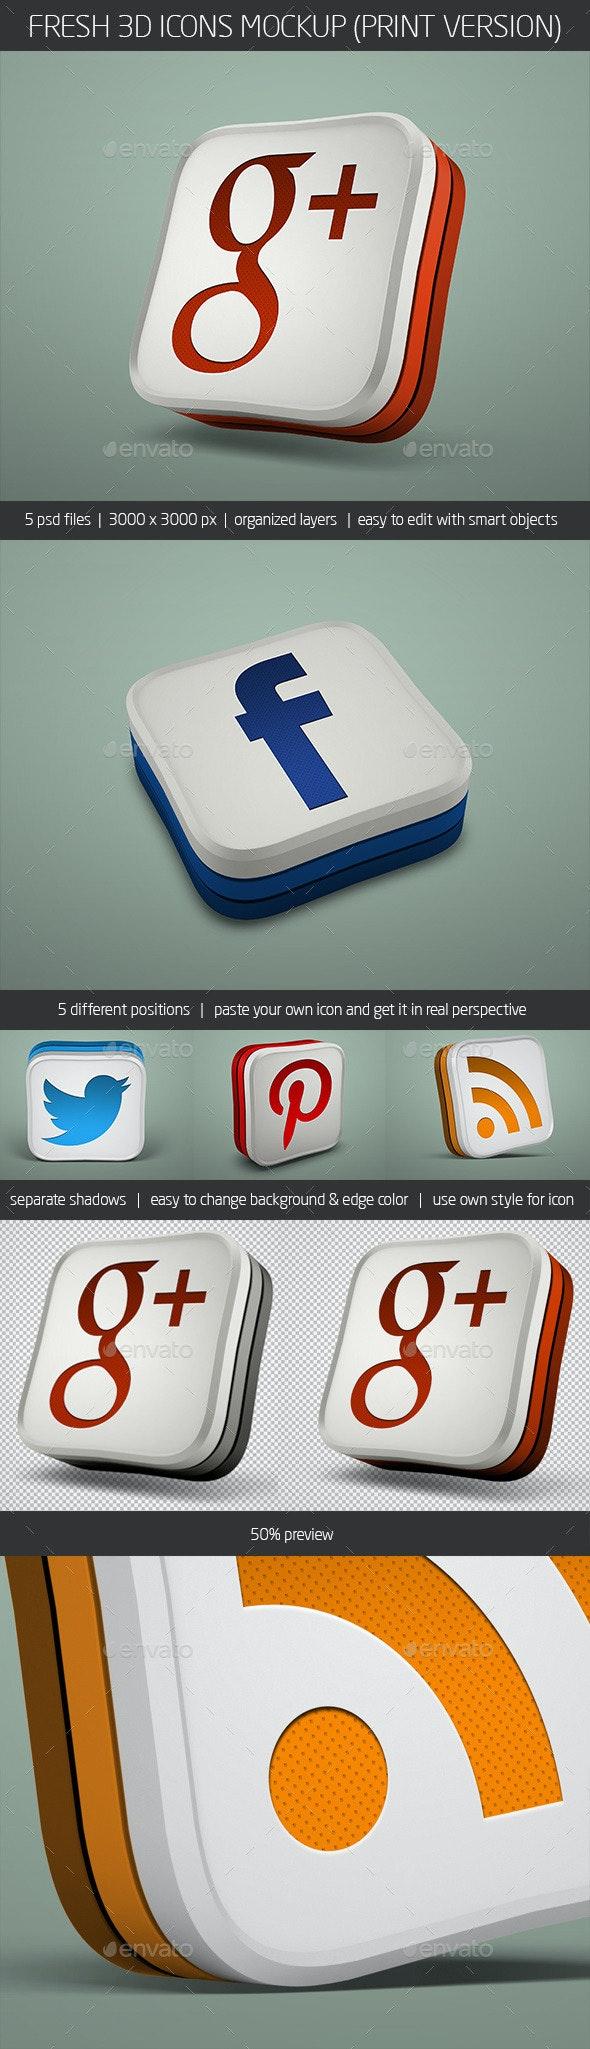 Fresh 3D Icons Mockup (Print Version) - Miscellaneous Displays